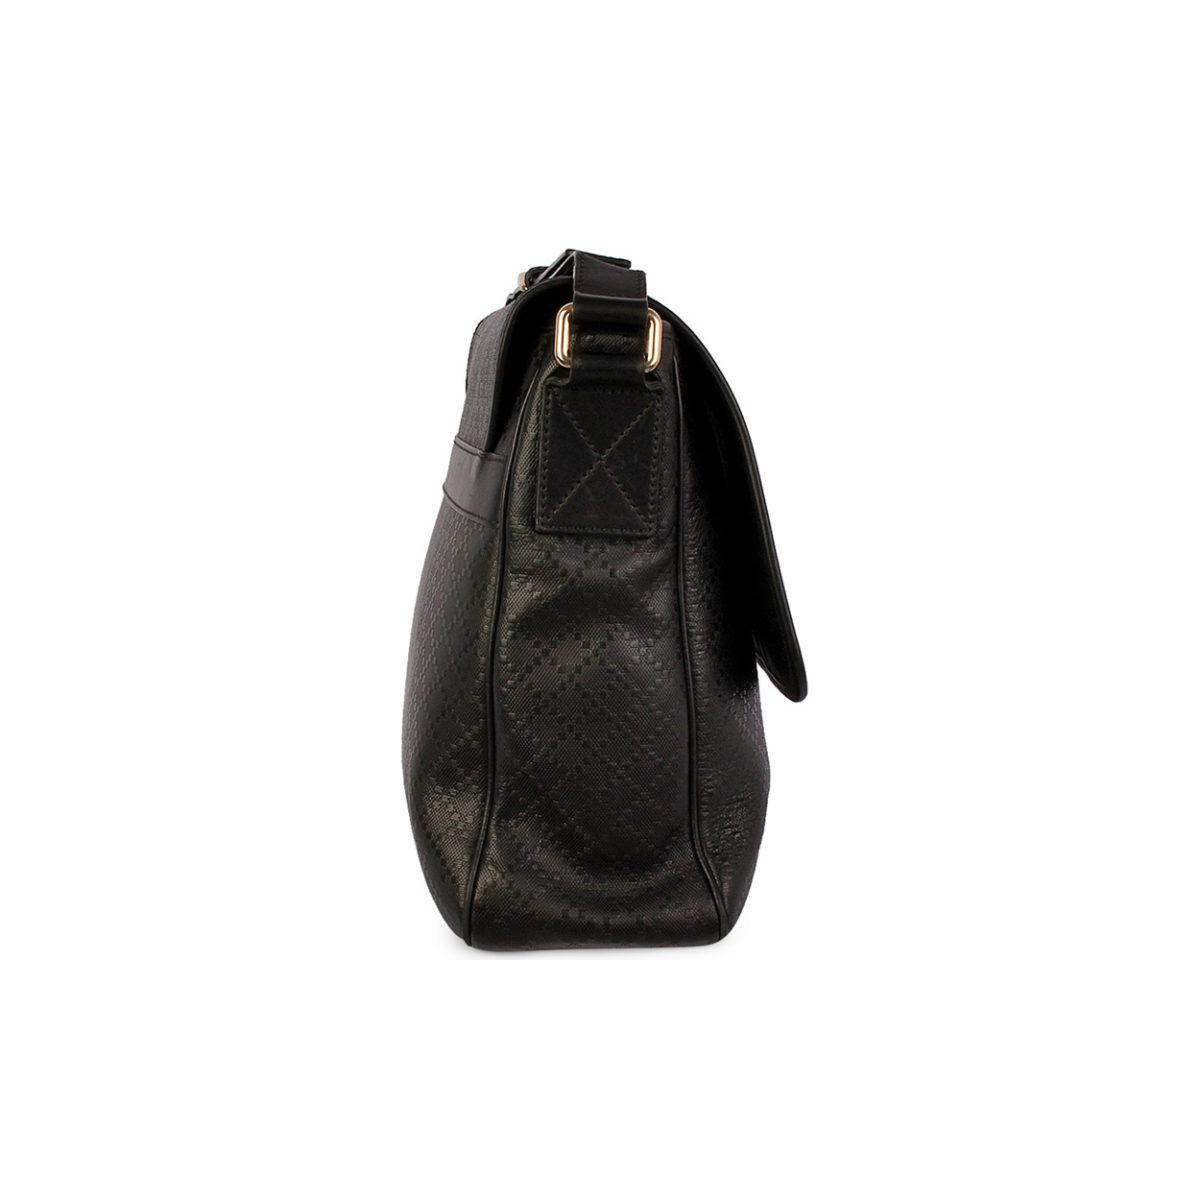 99f778932db4e6 GUCCI Diamante Leather Messenger Bag Black | Luxity